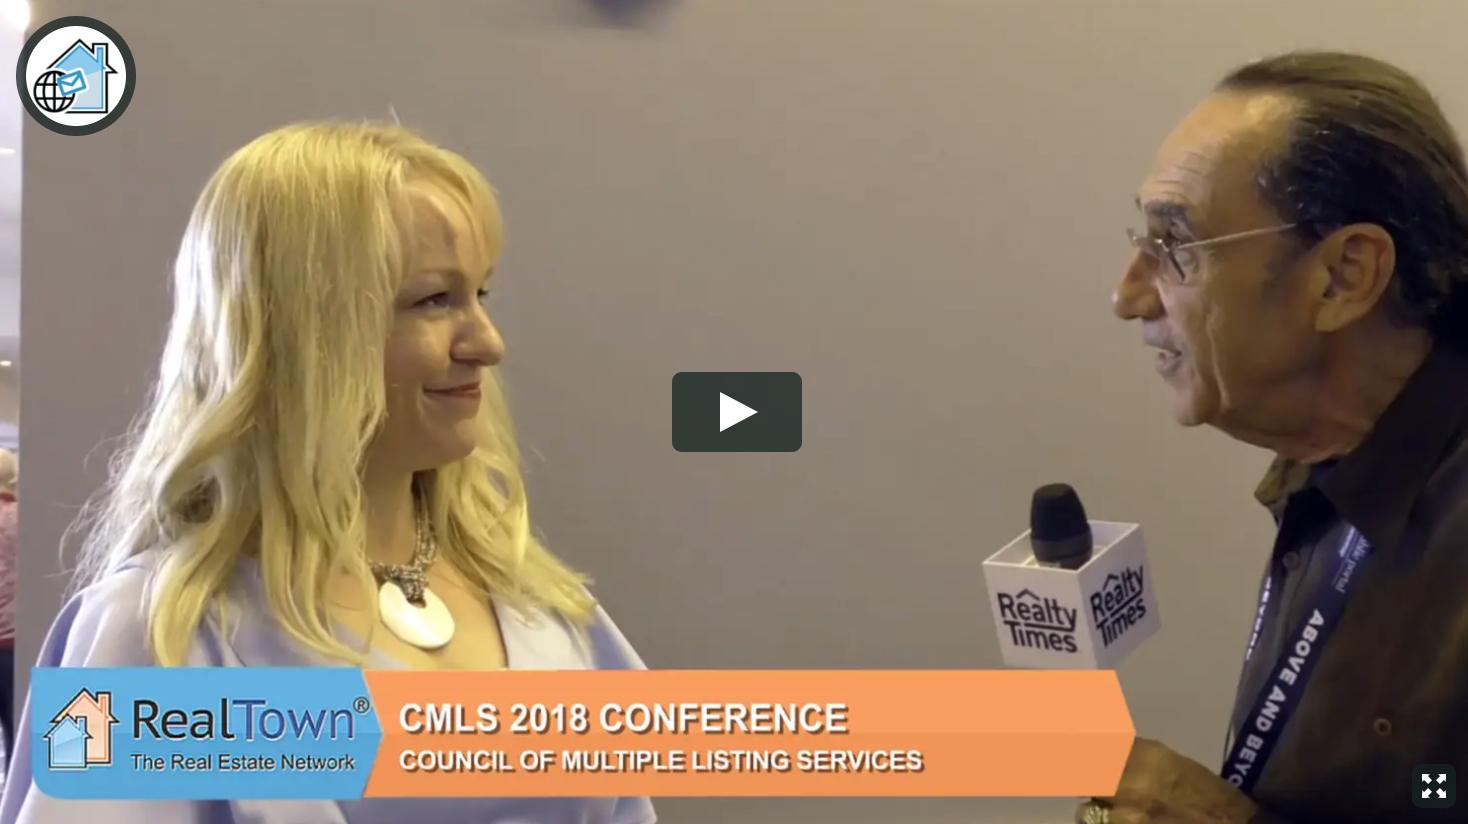 Above and Beyond CMLS2018 - Saul Klein interviews Rebecca Jensen